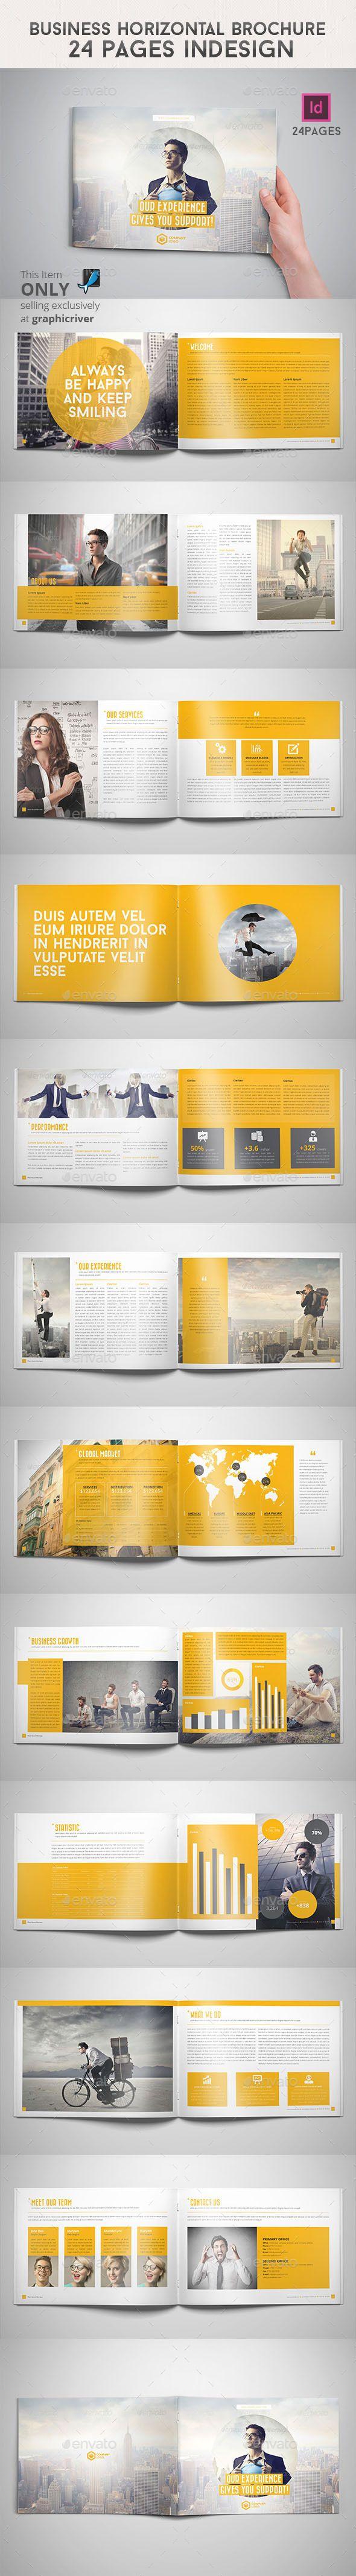 Business Horizontal Brochure 24 Pages Indesign | Brochures ...